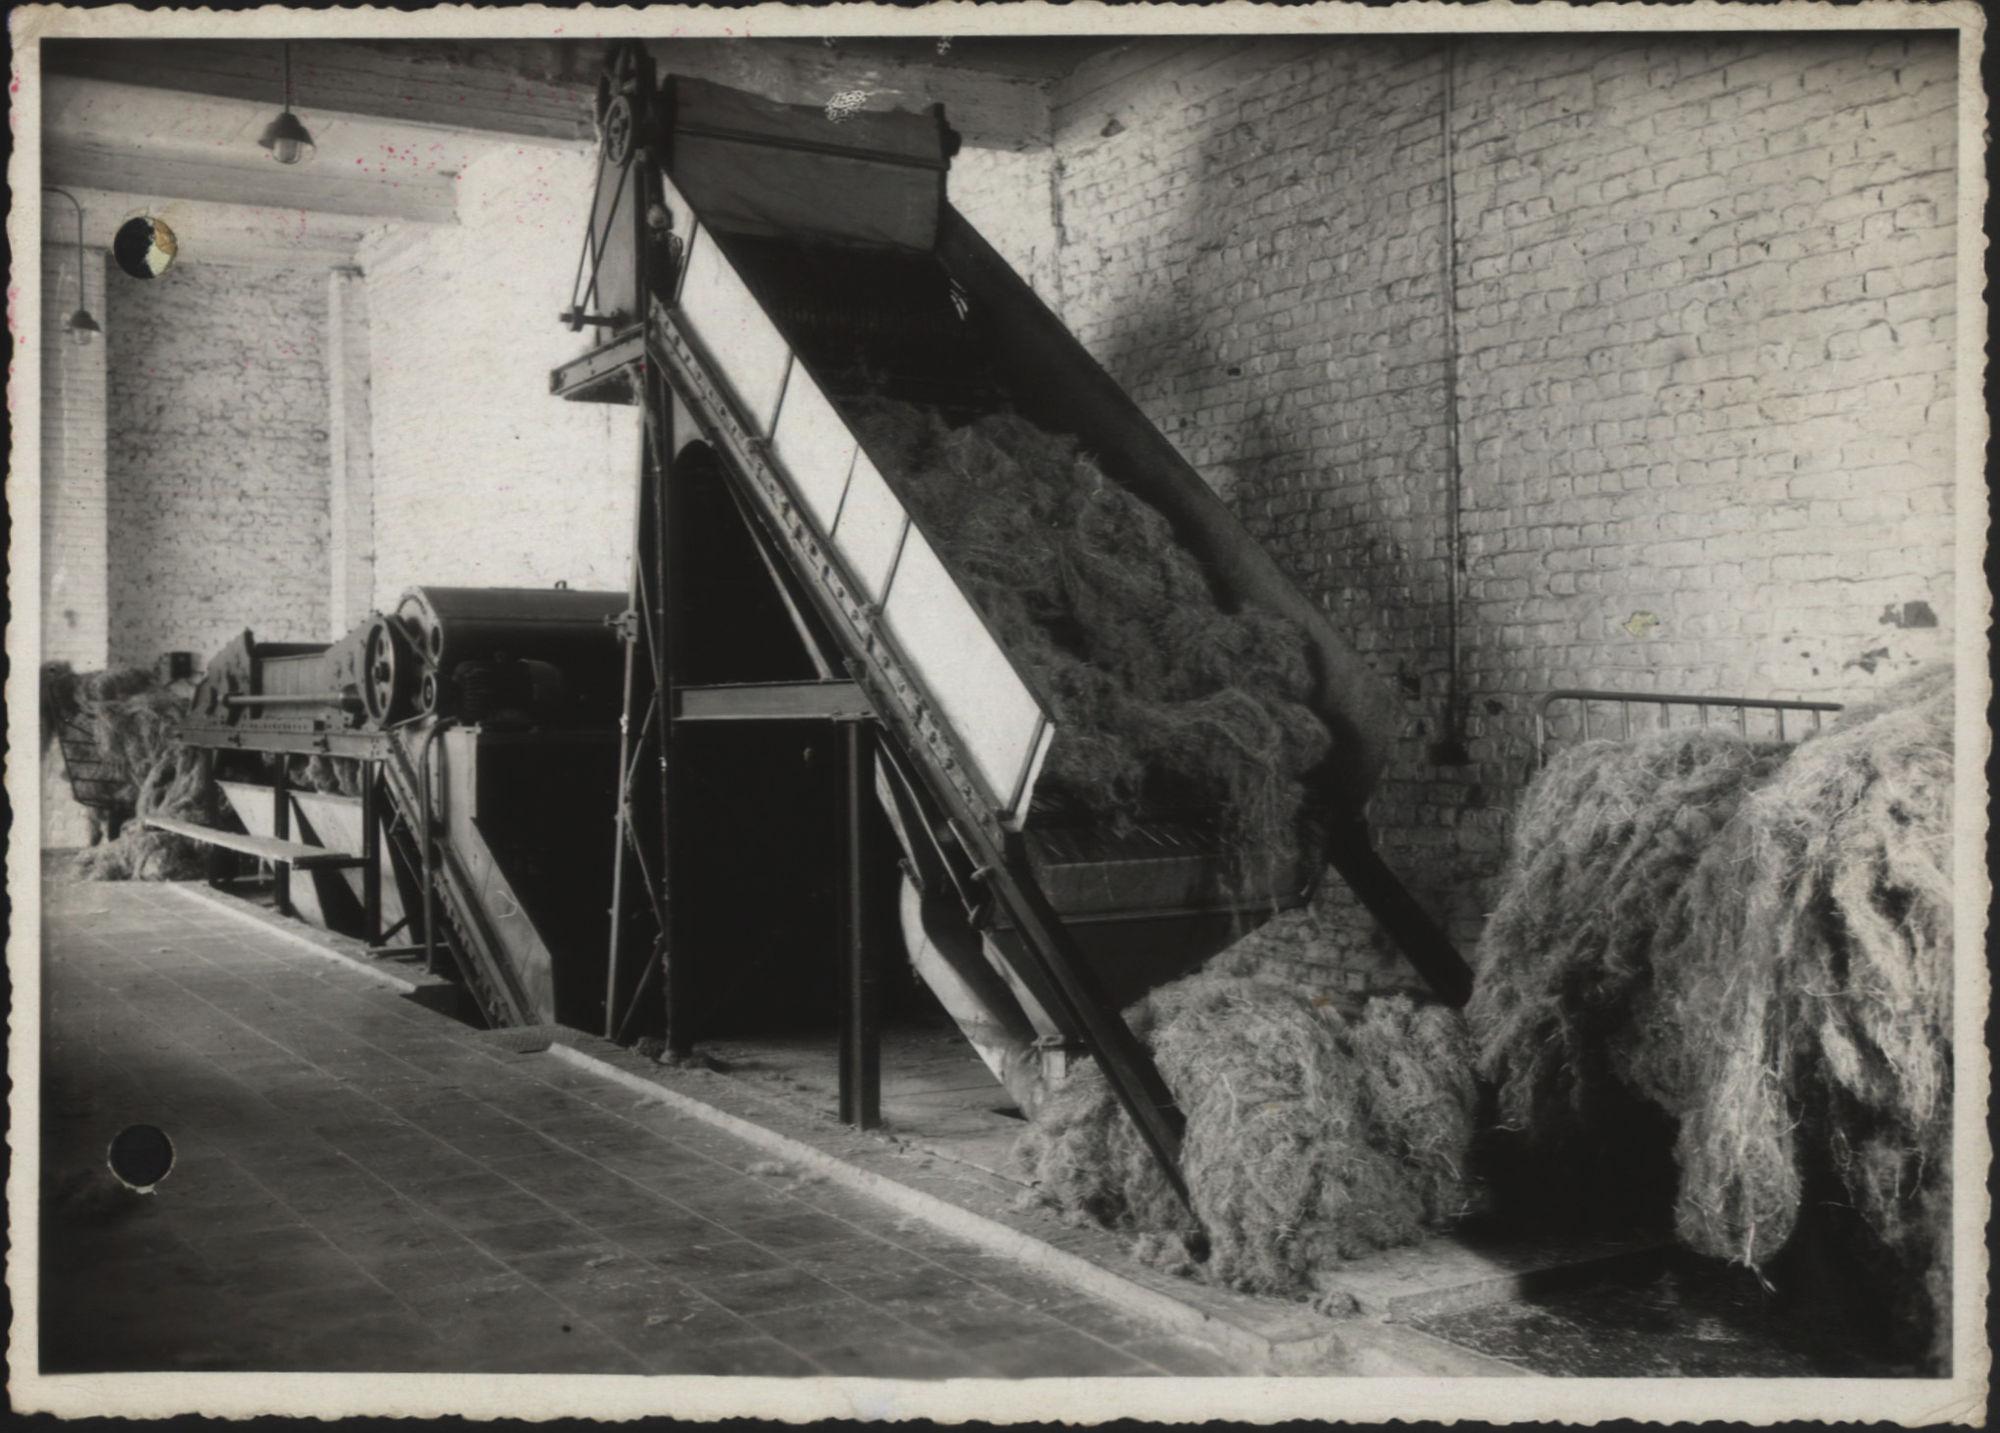 Kloddenmachine Vansteenkiste & Charle